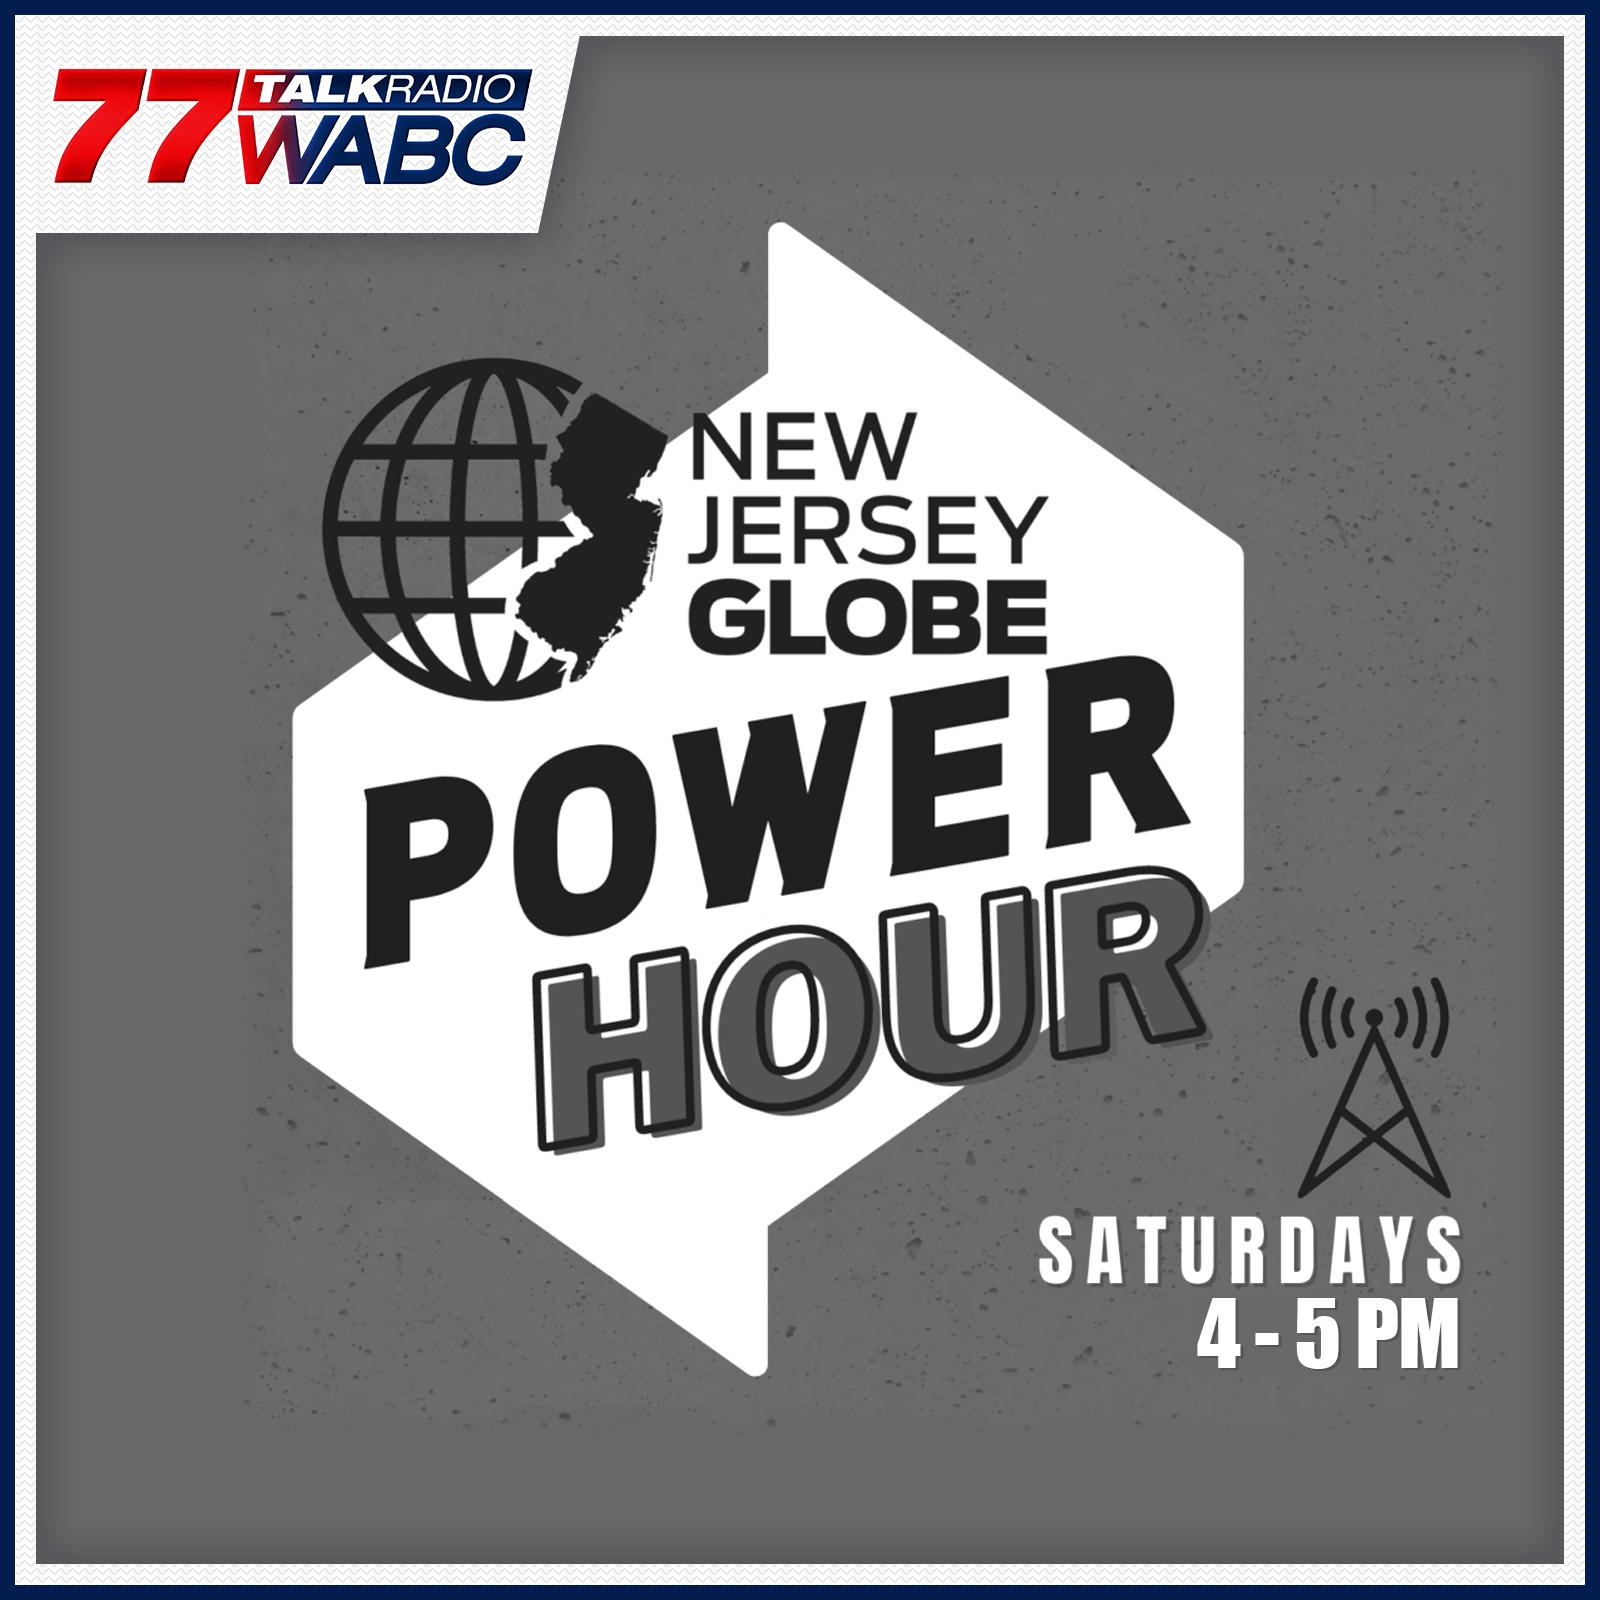 New Jersey Globe Power Hour